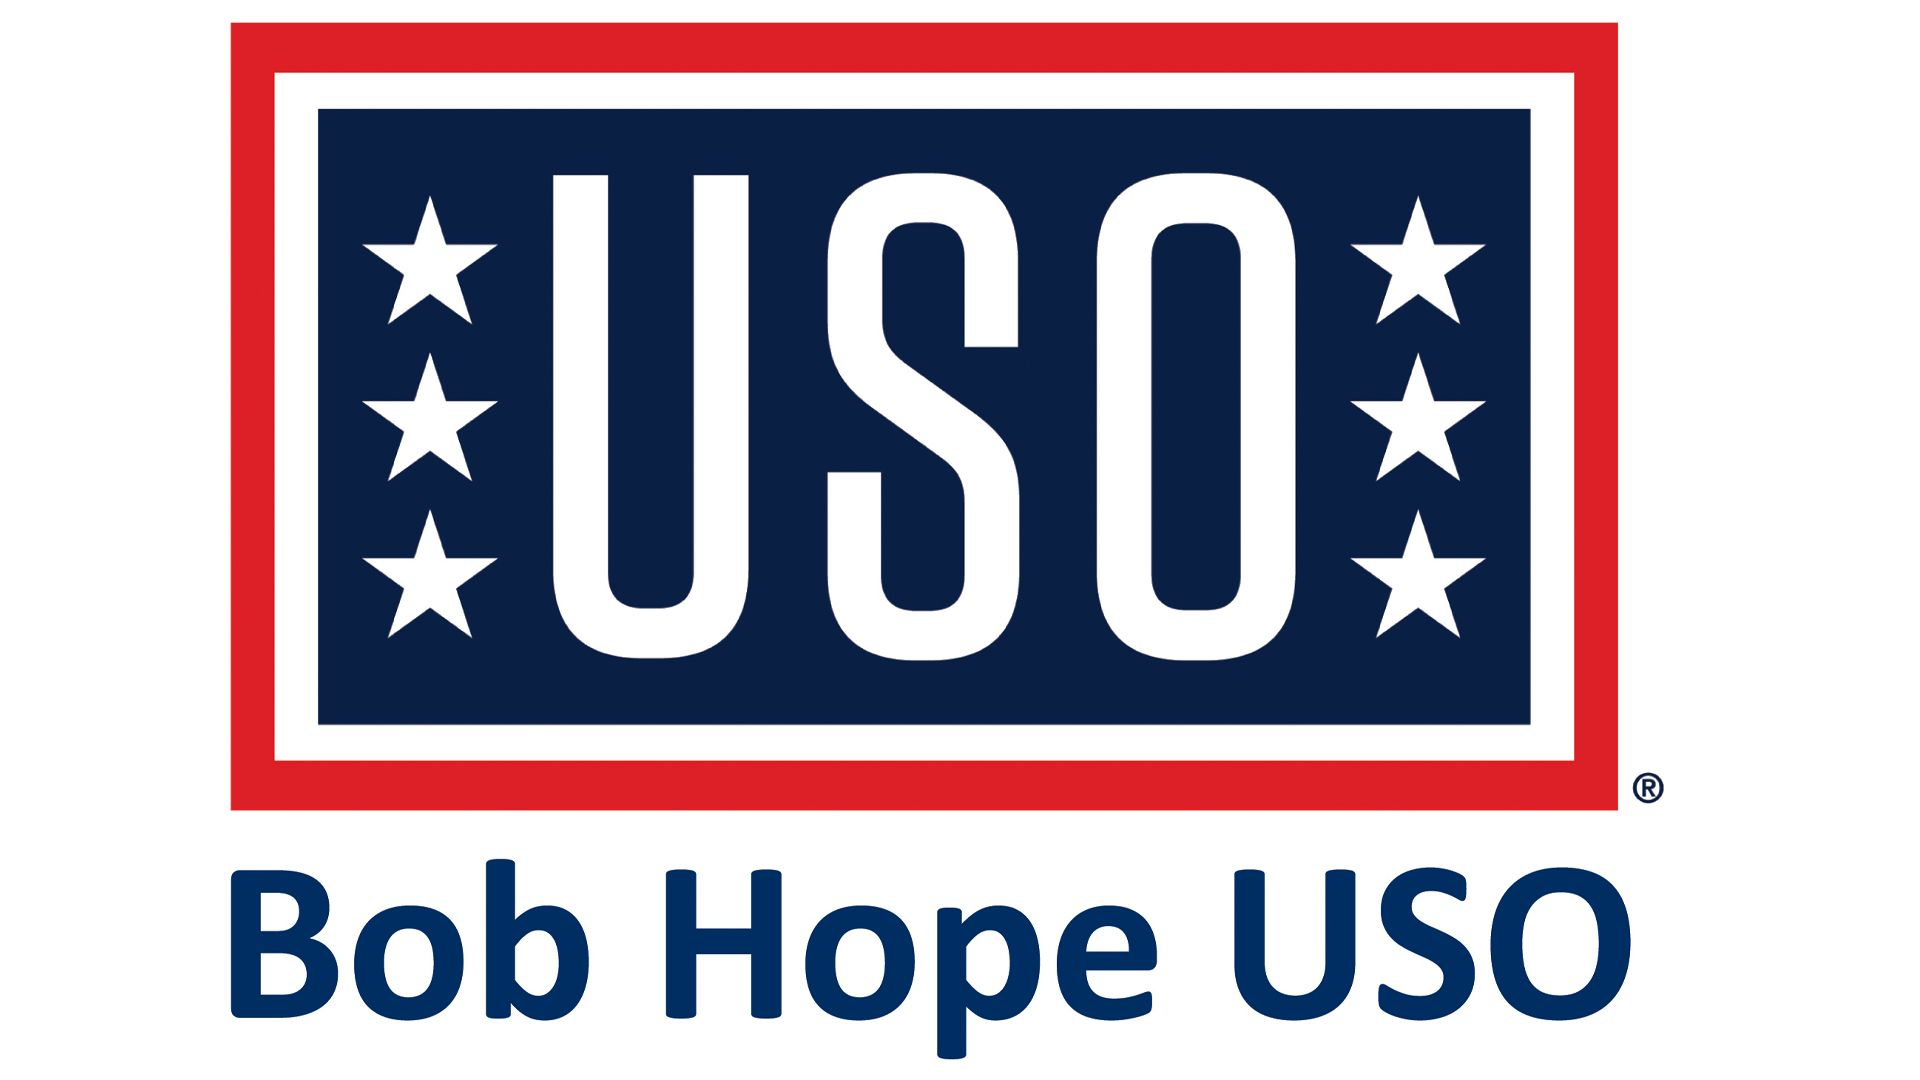 bob-hope-uso-military-partners